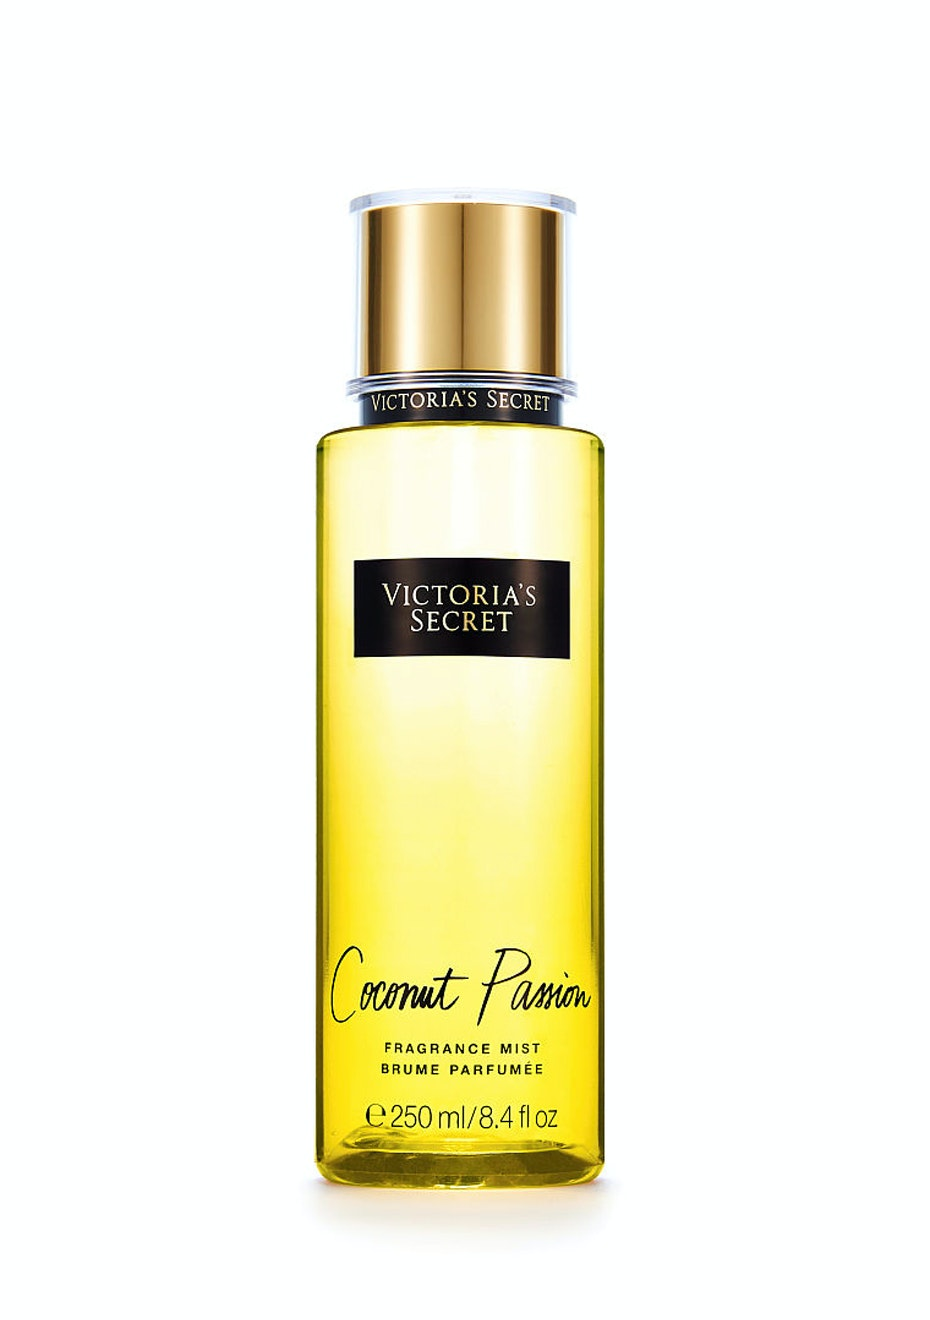 Victoria's Secret New Edition Coconut Passion Fragrance Mist 250ml